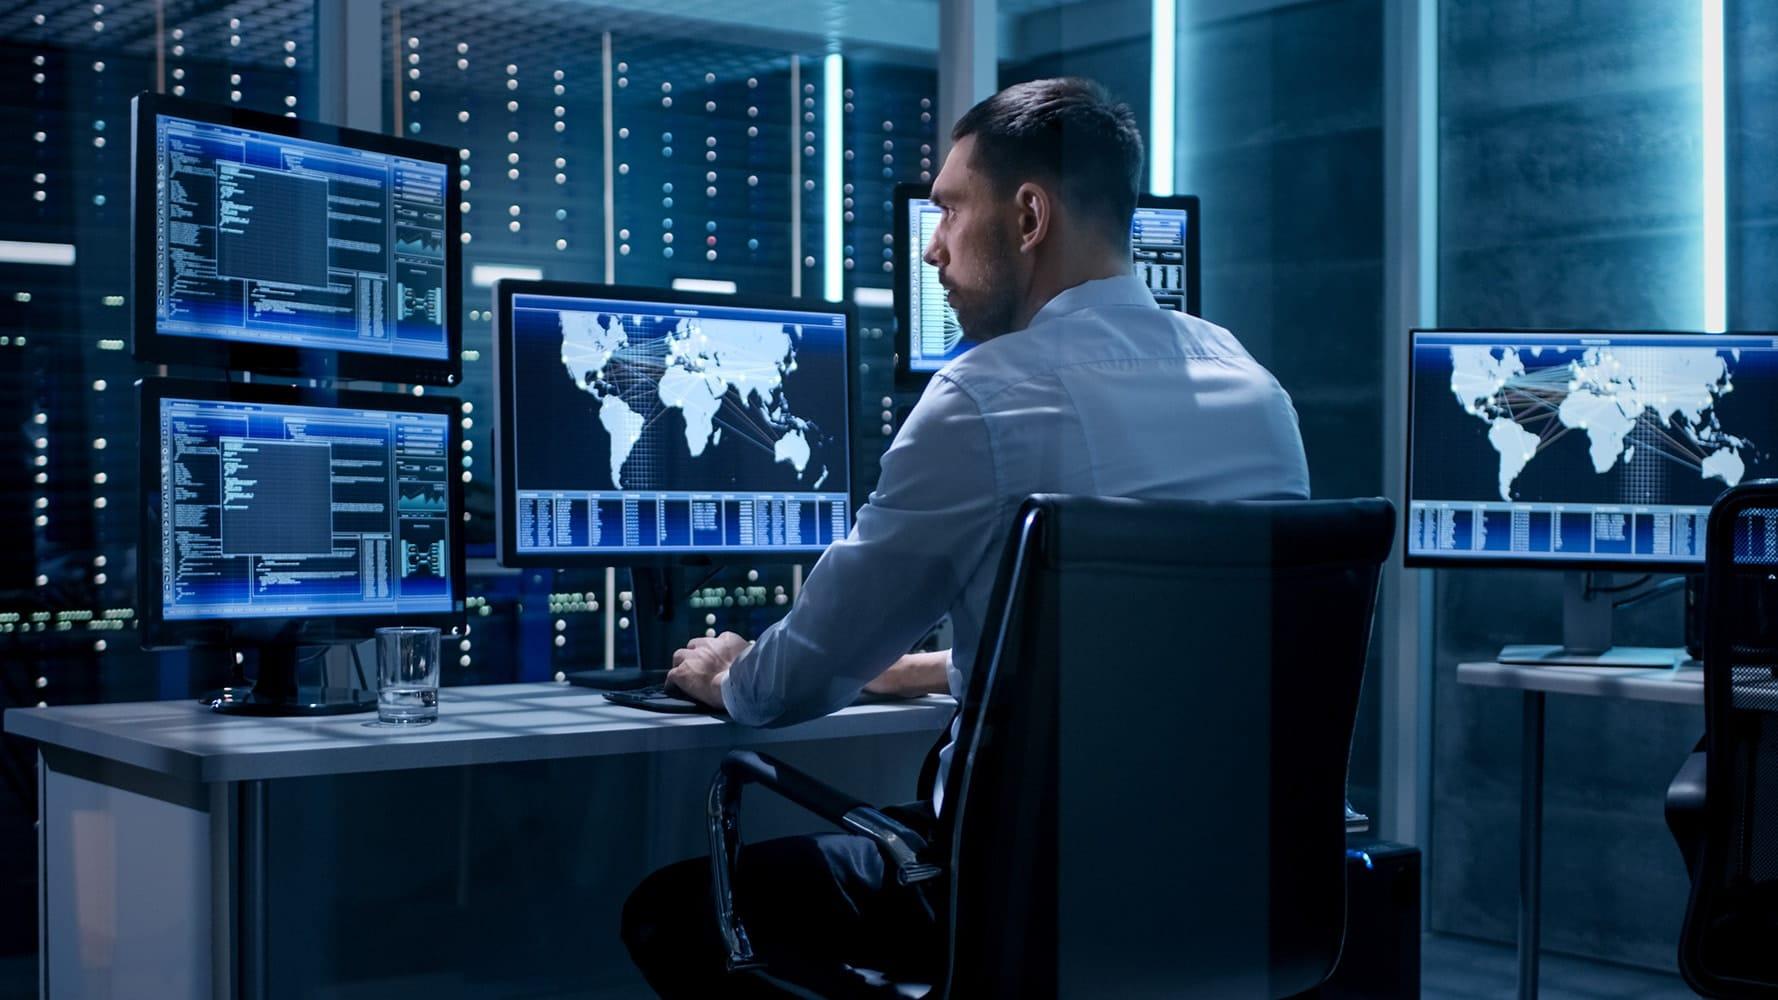 Digital & Security